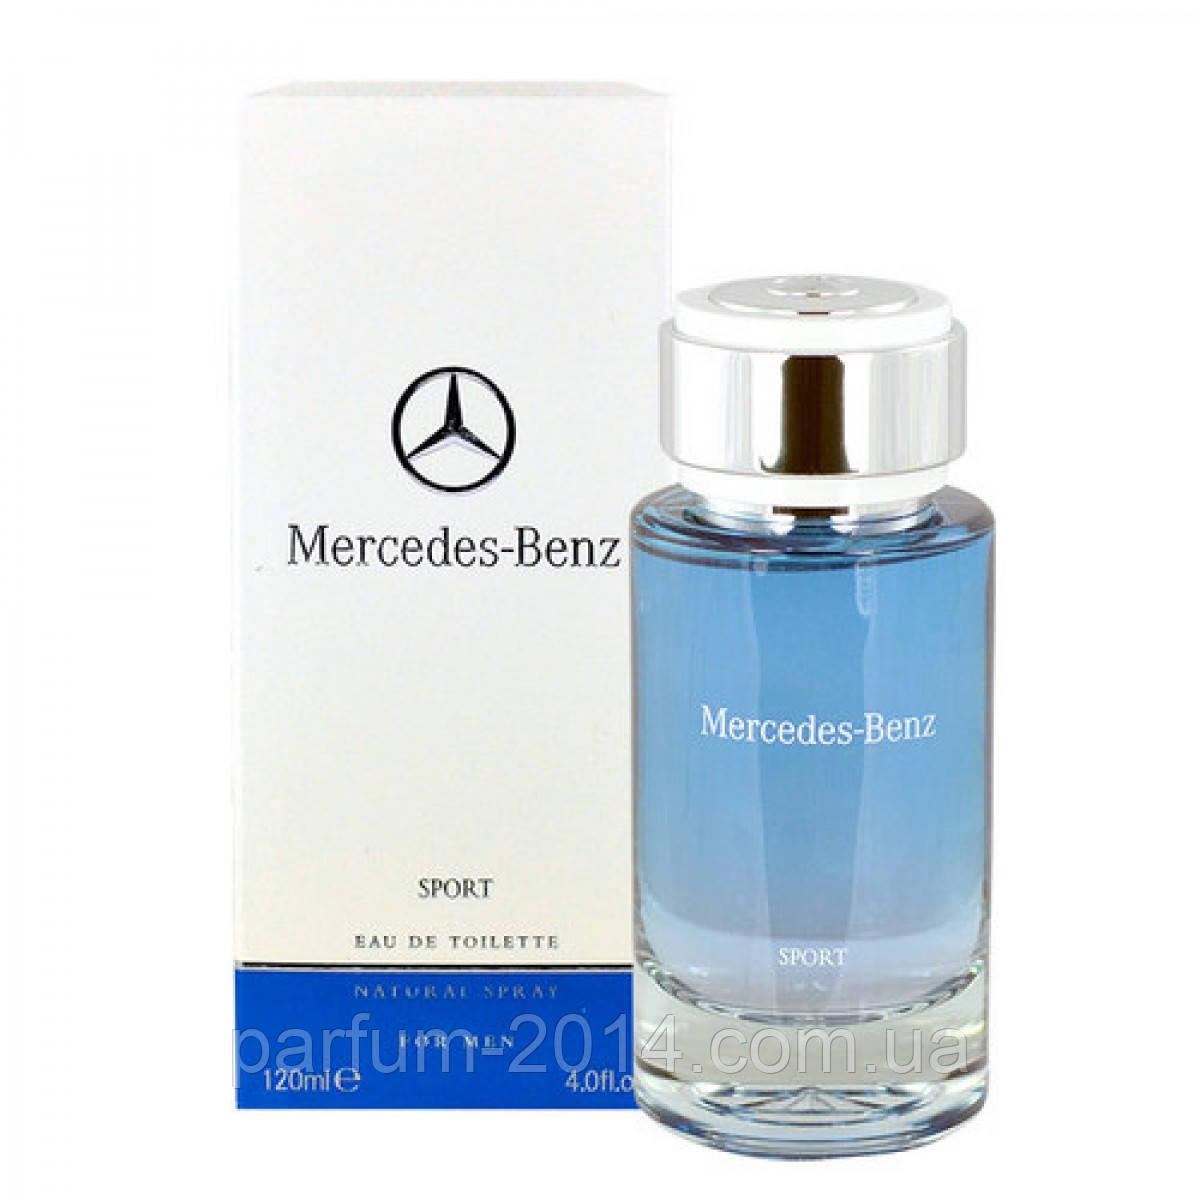 Мужская туалетная вода Mercedes-Benz Mercedes Benz Sport 120 ml (реплика)